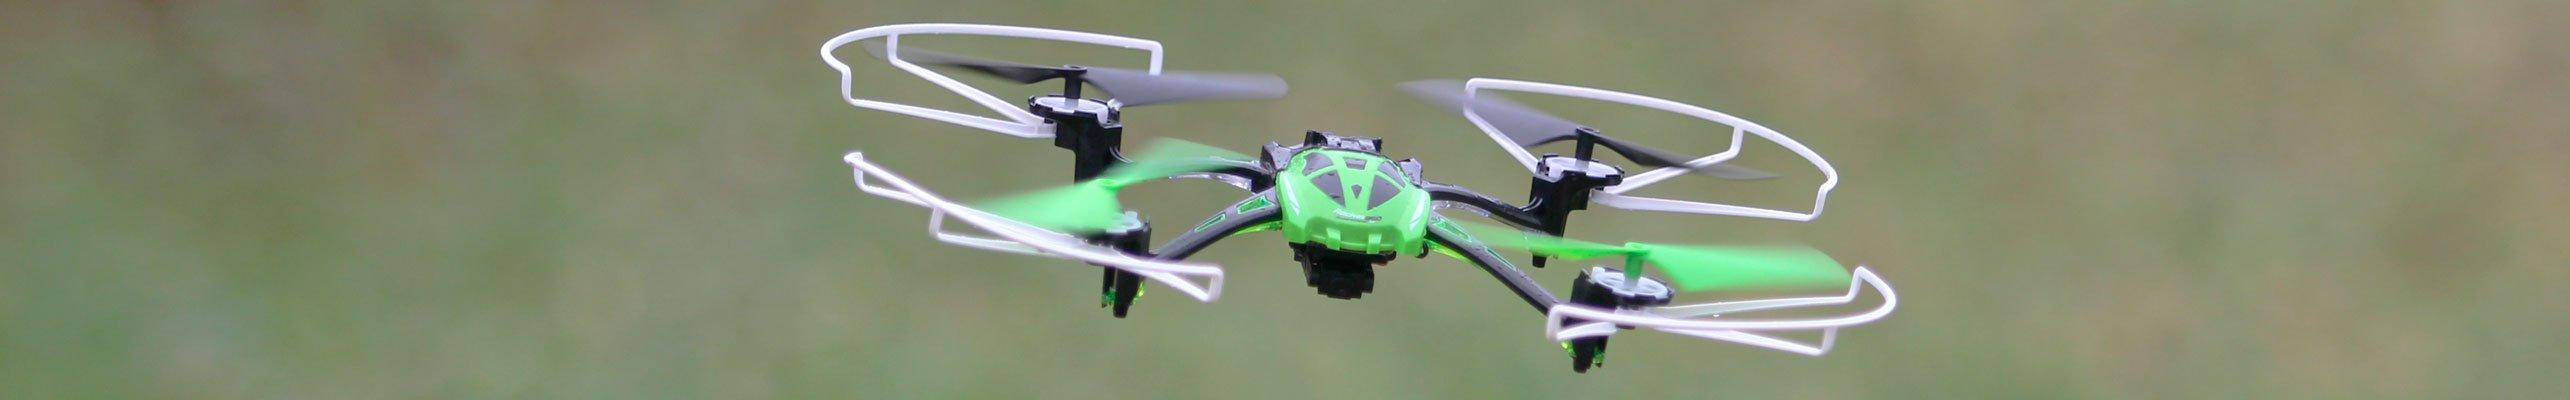 Rocket 250 3D - 4 Kanal RTF Quadrocopter mit Kamera